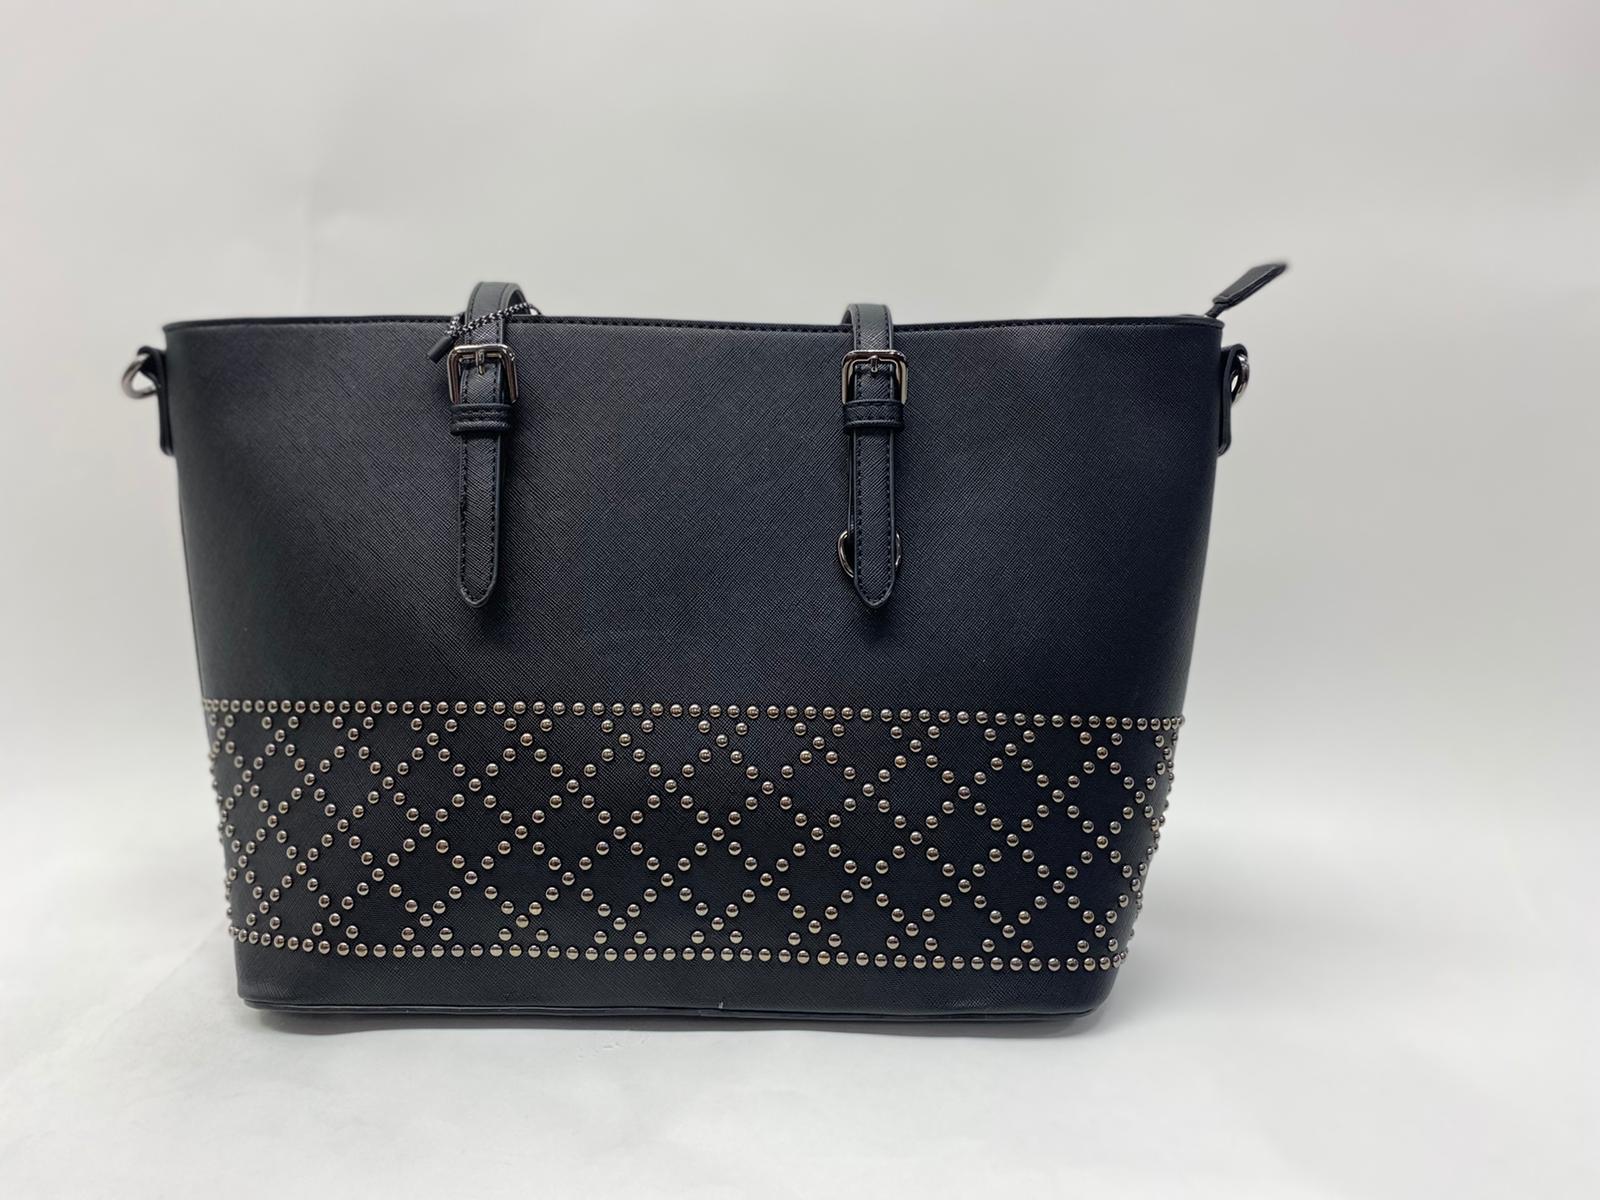 Handtasche mit Nietenmuster